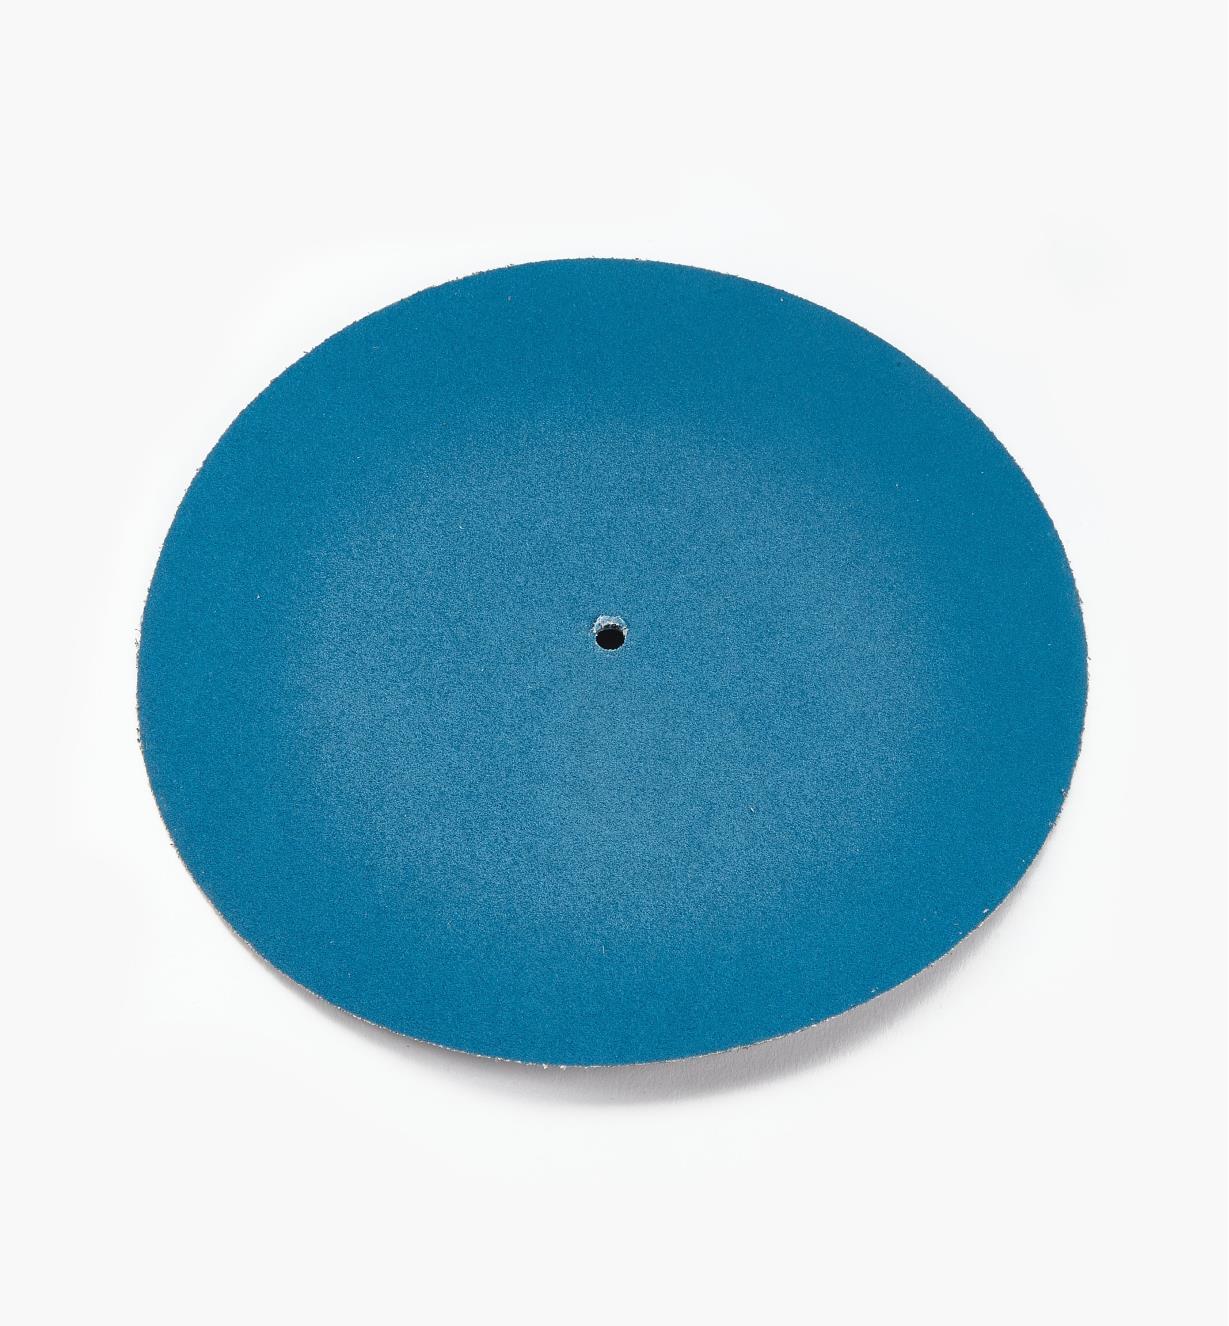 "05M3016 - 8"" Zirconia Disc, 120x"